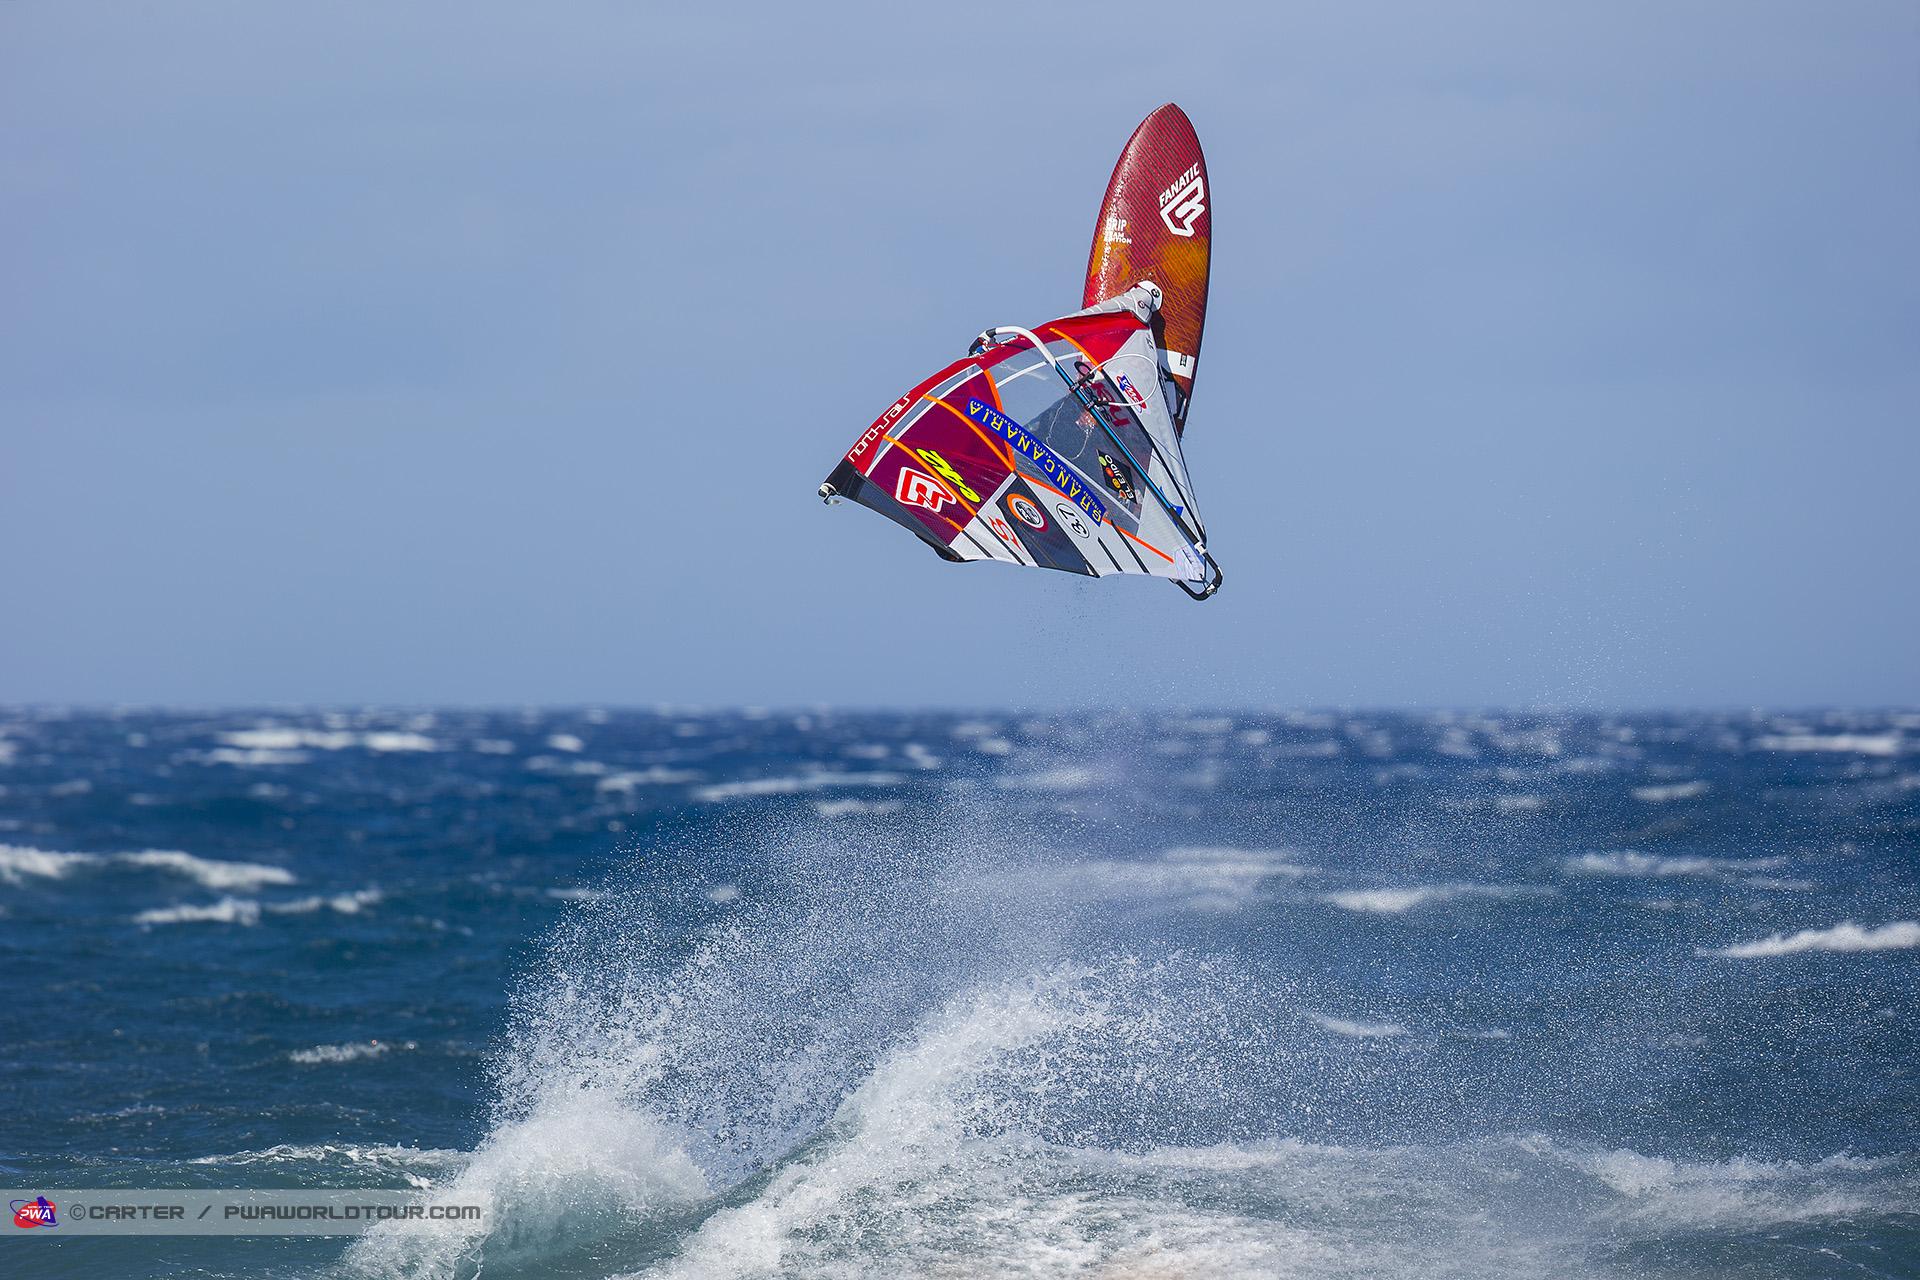 GC17_wv_Fernandez_takes_off.jpg